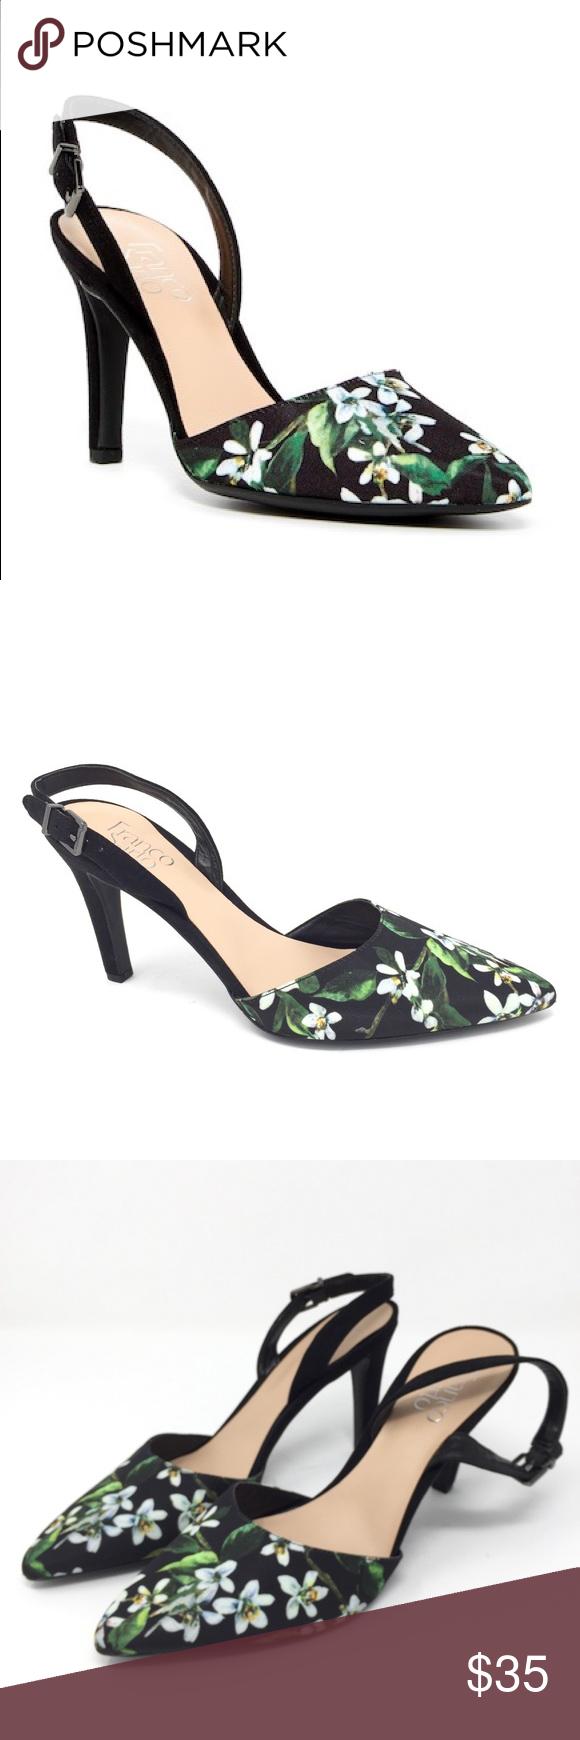 473021234bb Spotted while shopping on Poshmark  9.5M FRANCO SARTO Ablaze floral sling  back heels!  poshmark  fashion  shopping  style  Franco Sarto  Shoes